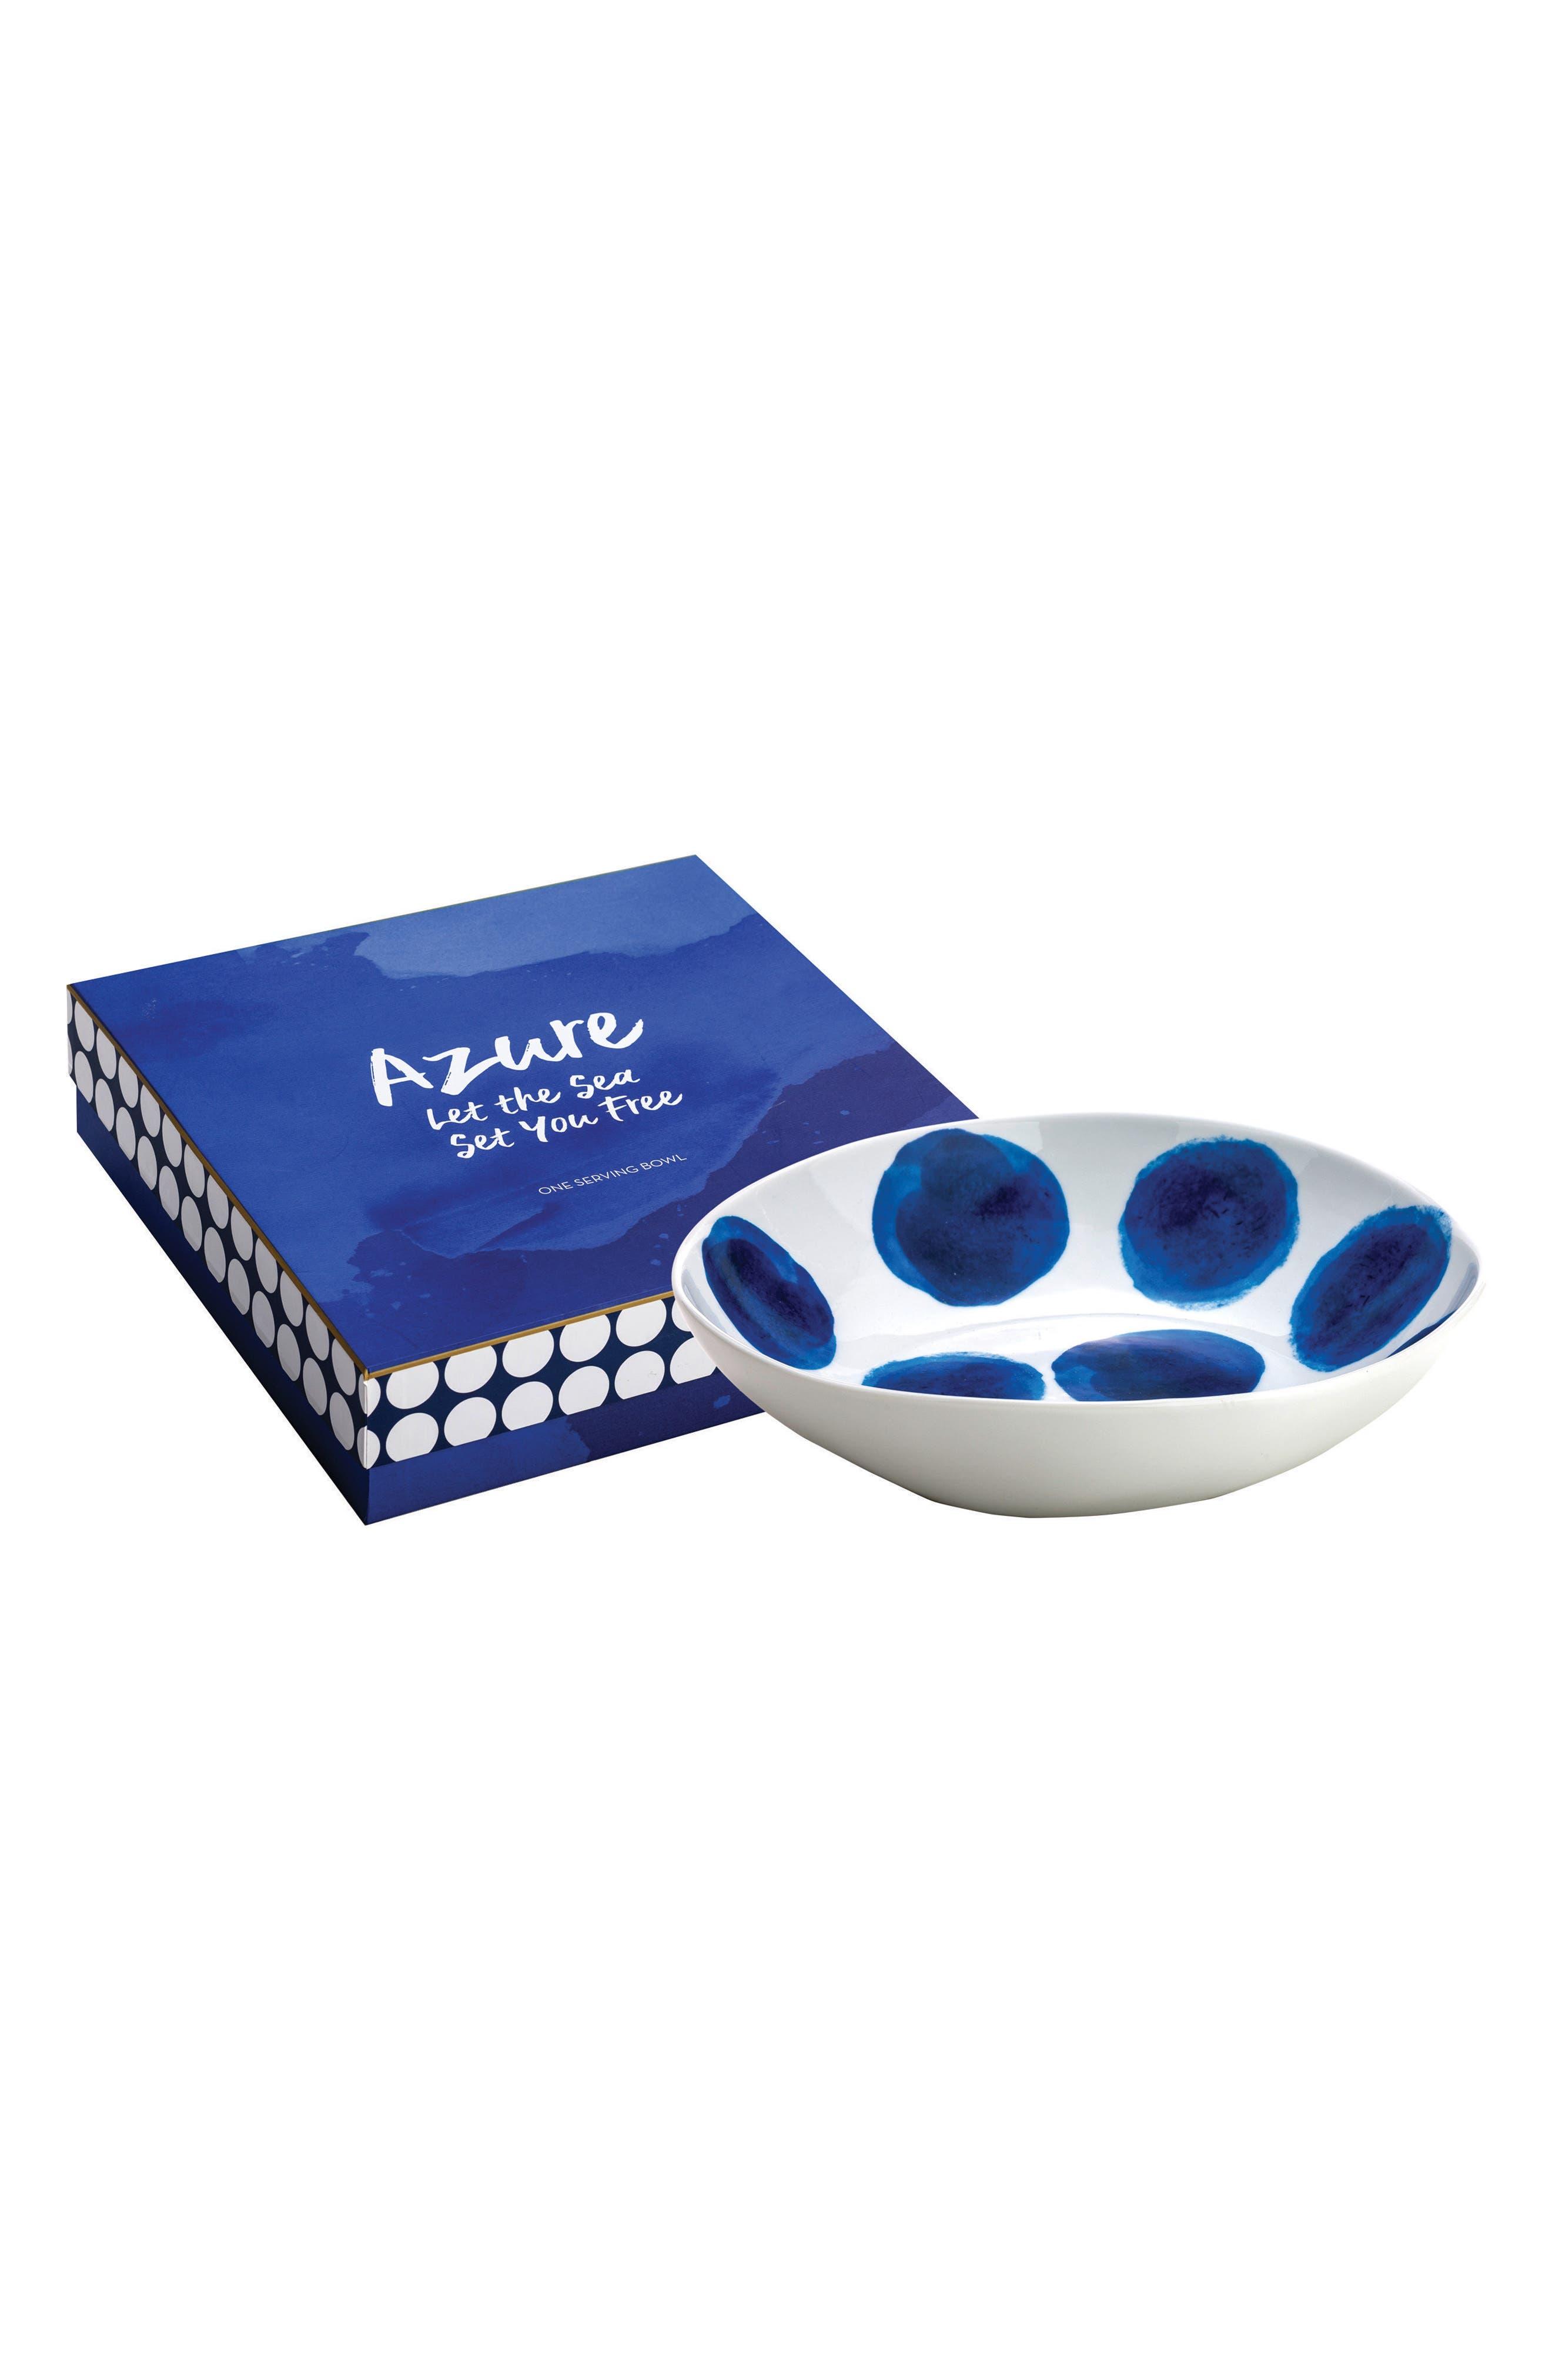 Polka Dot Serving Bowl,                         Main,                         color, Blue/ White